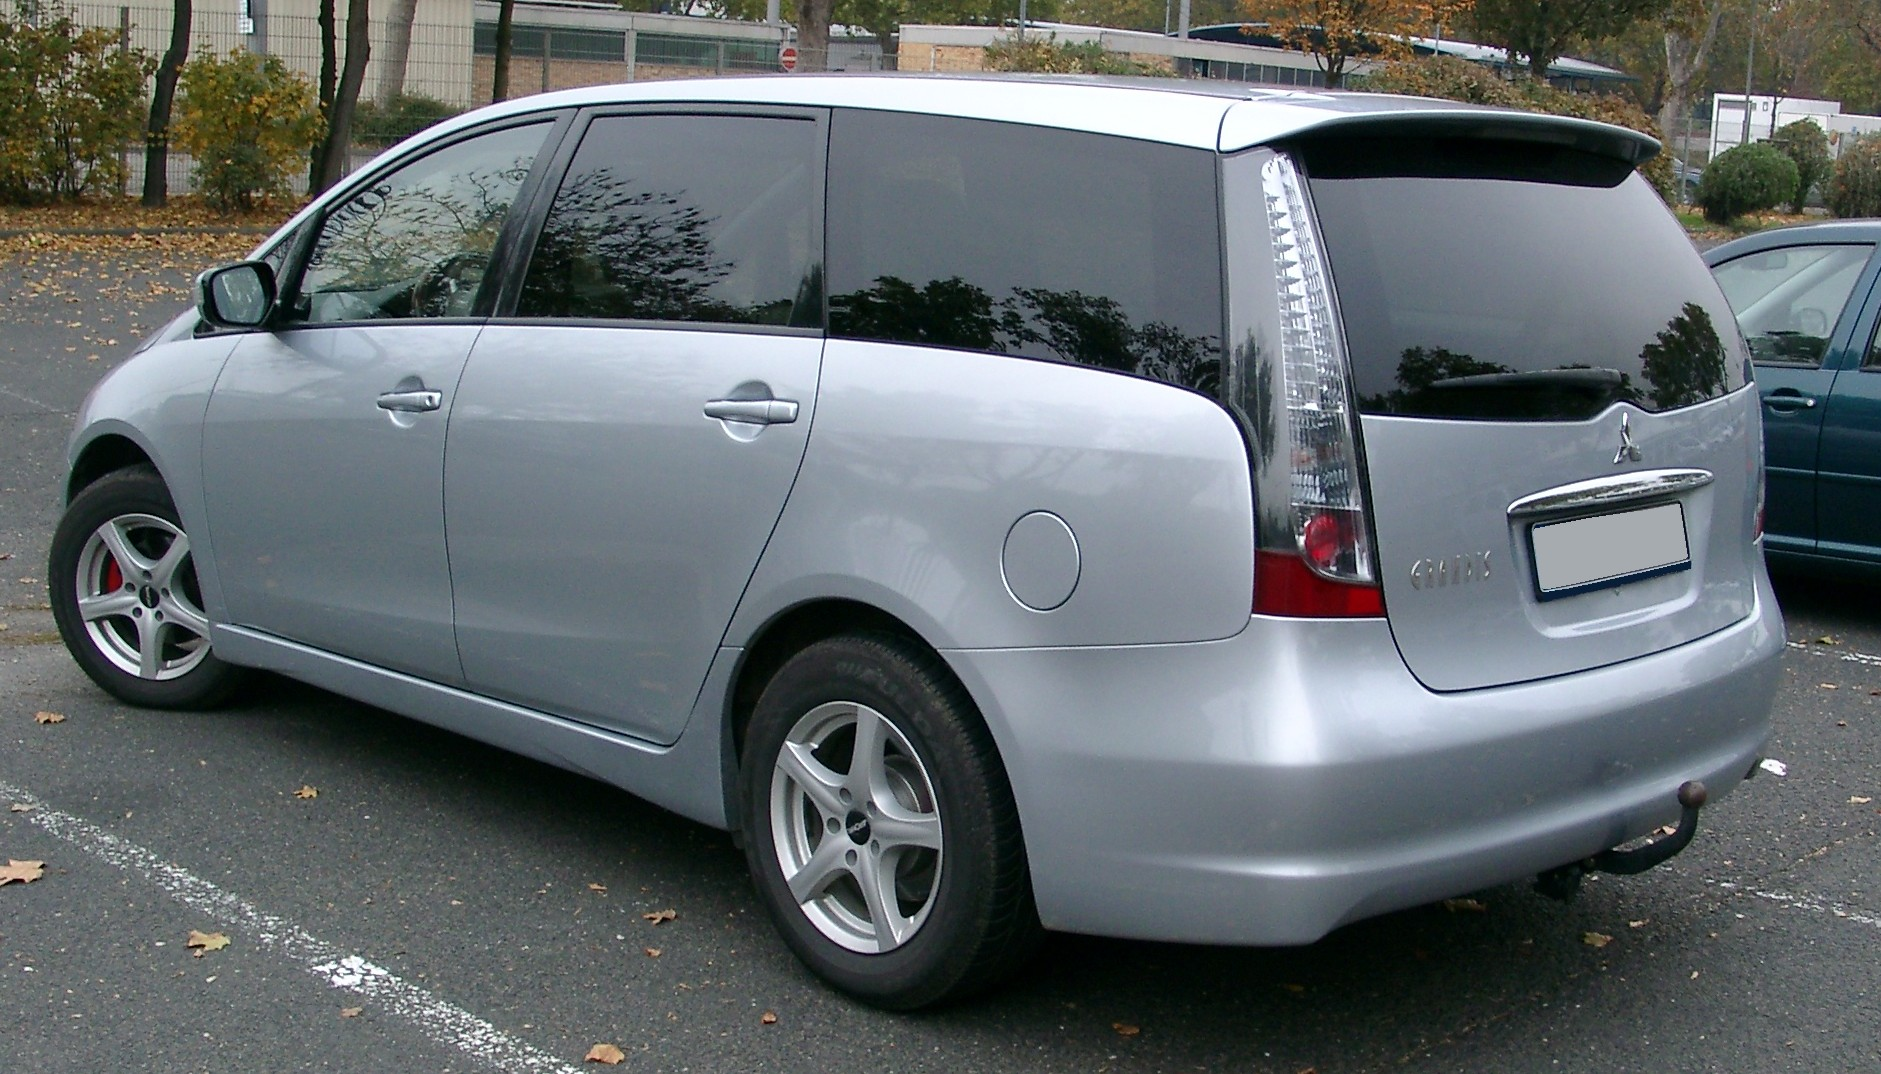 Mitsubishi Grandis rear image of High Resolution Picture